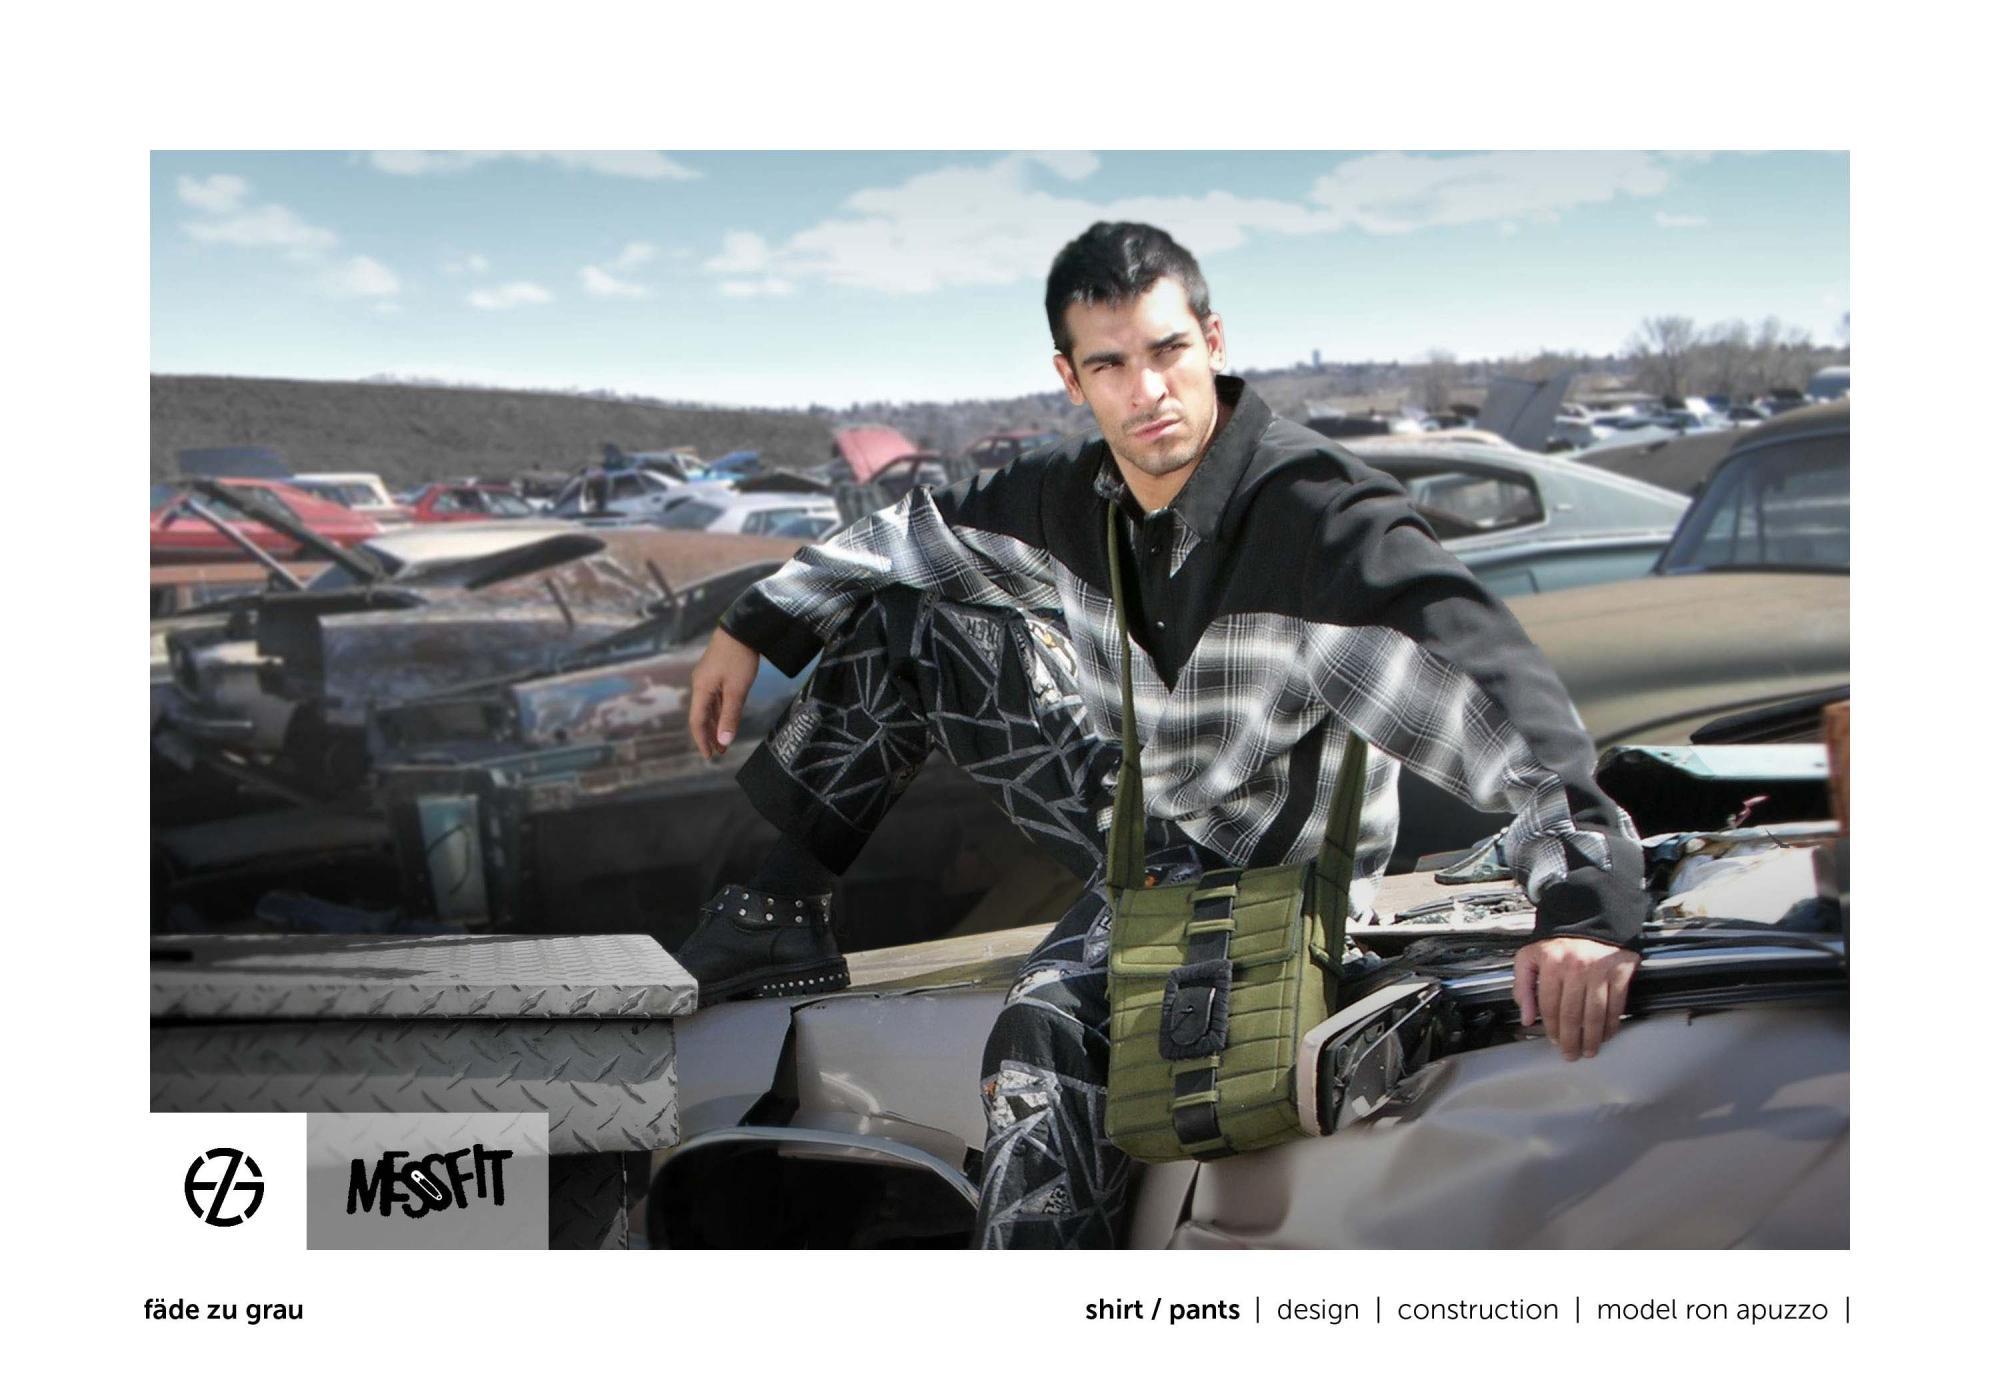 fäde zu grau | photo shoot | shirt, pants, bag